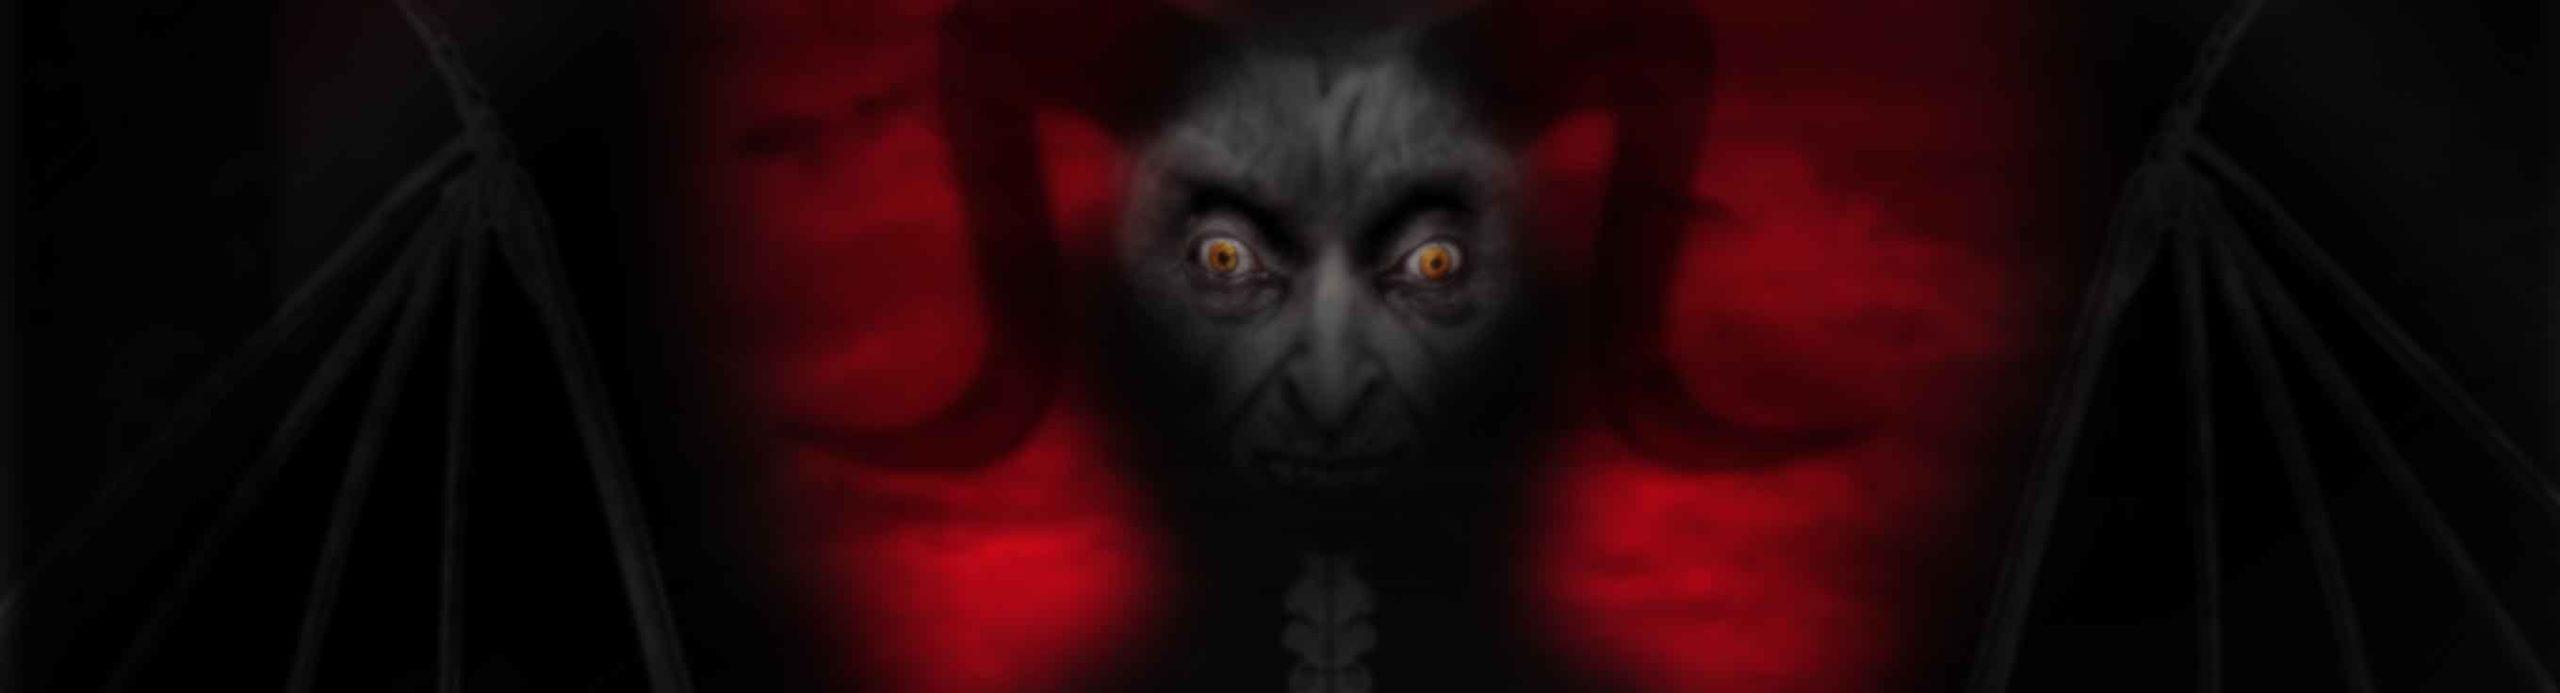 Dracula Serge bannière